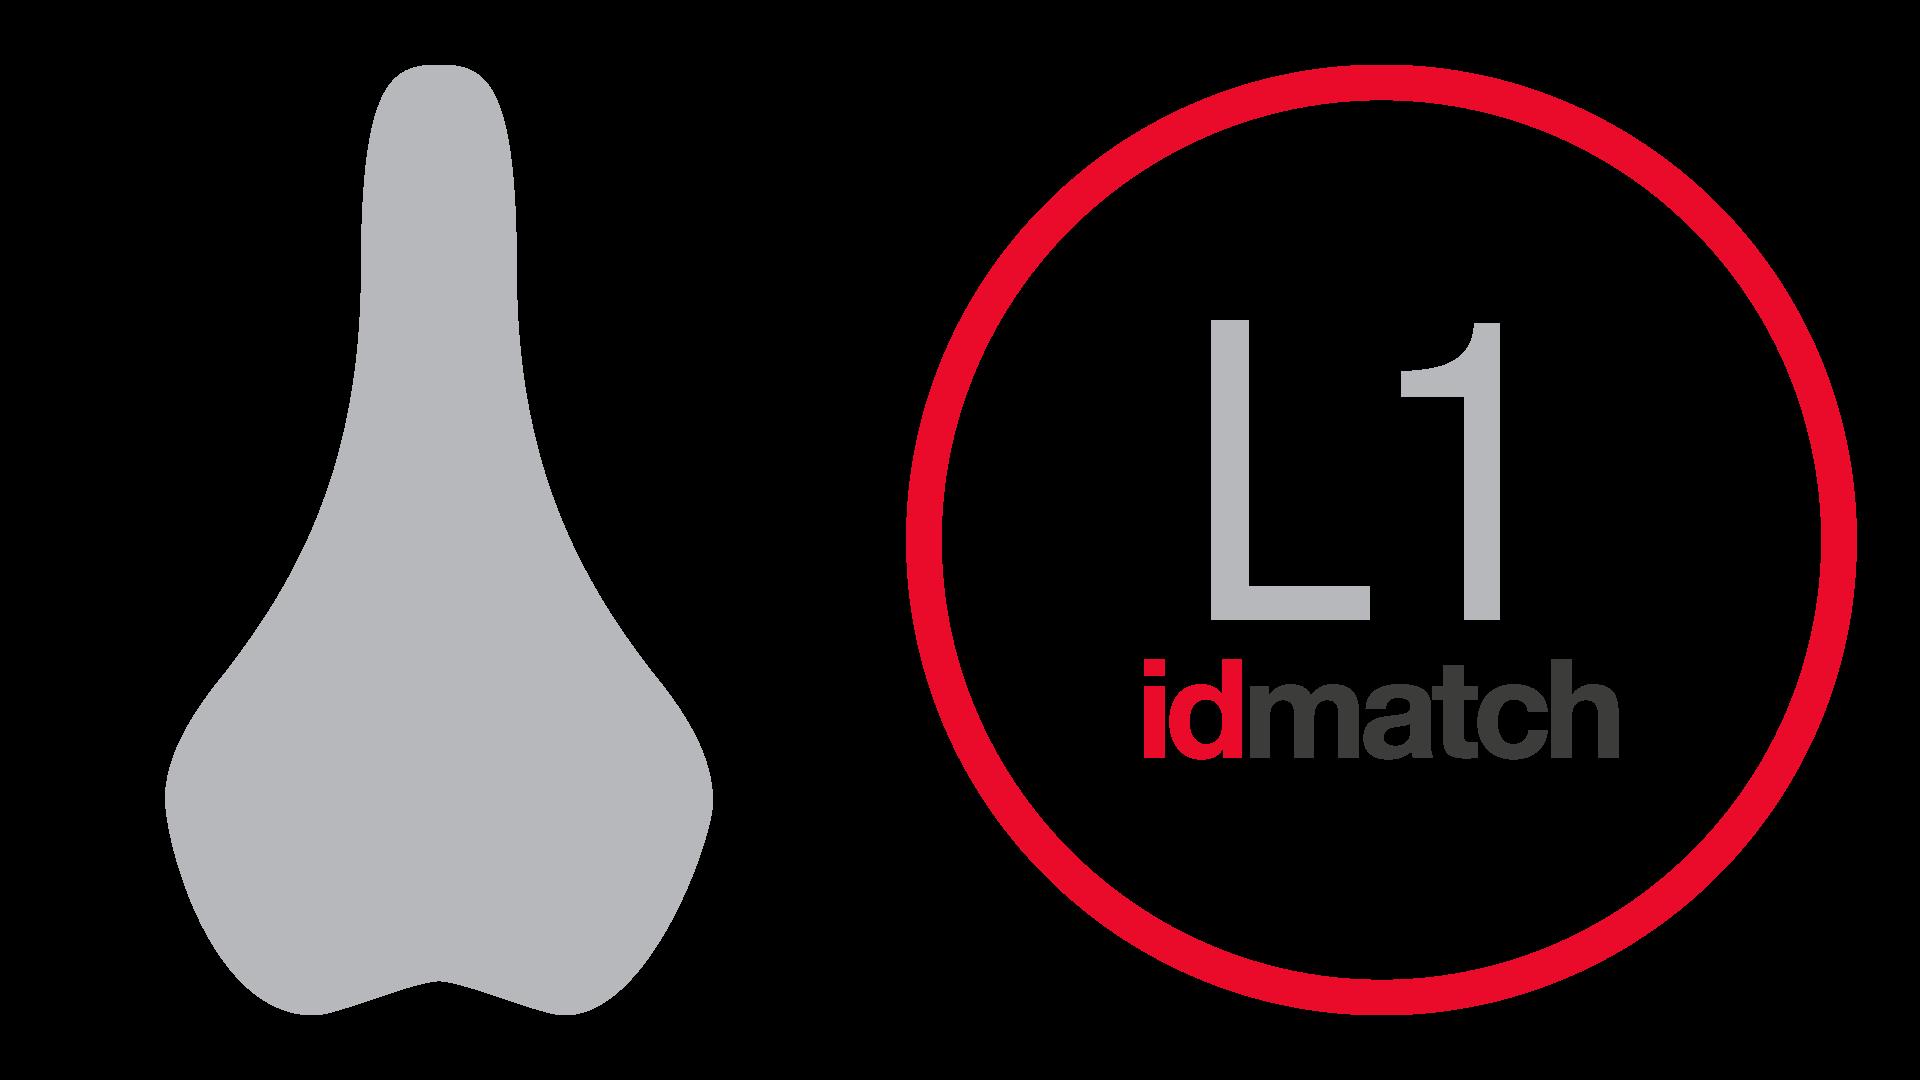 Selle-Italia-idmatch-04-L1-v2